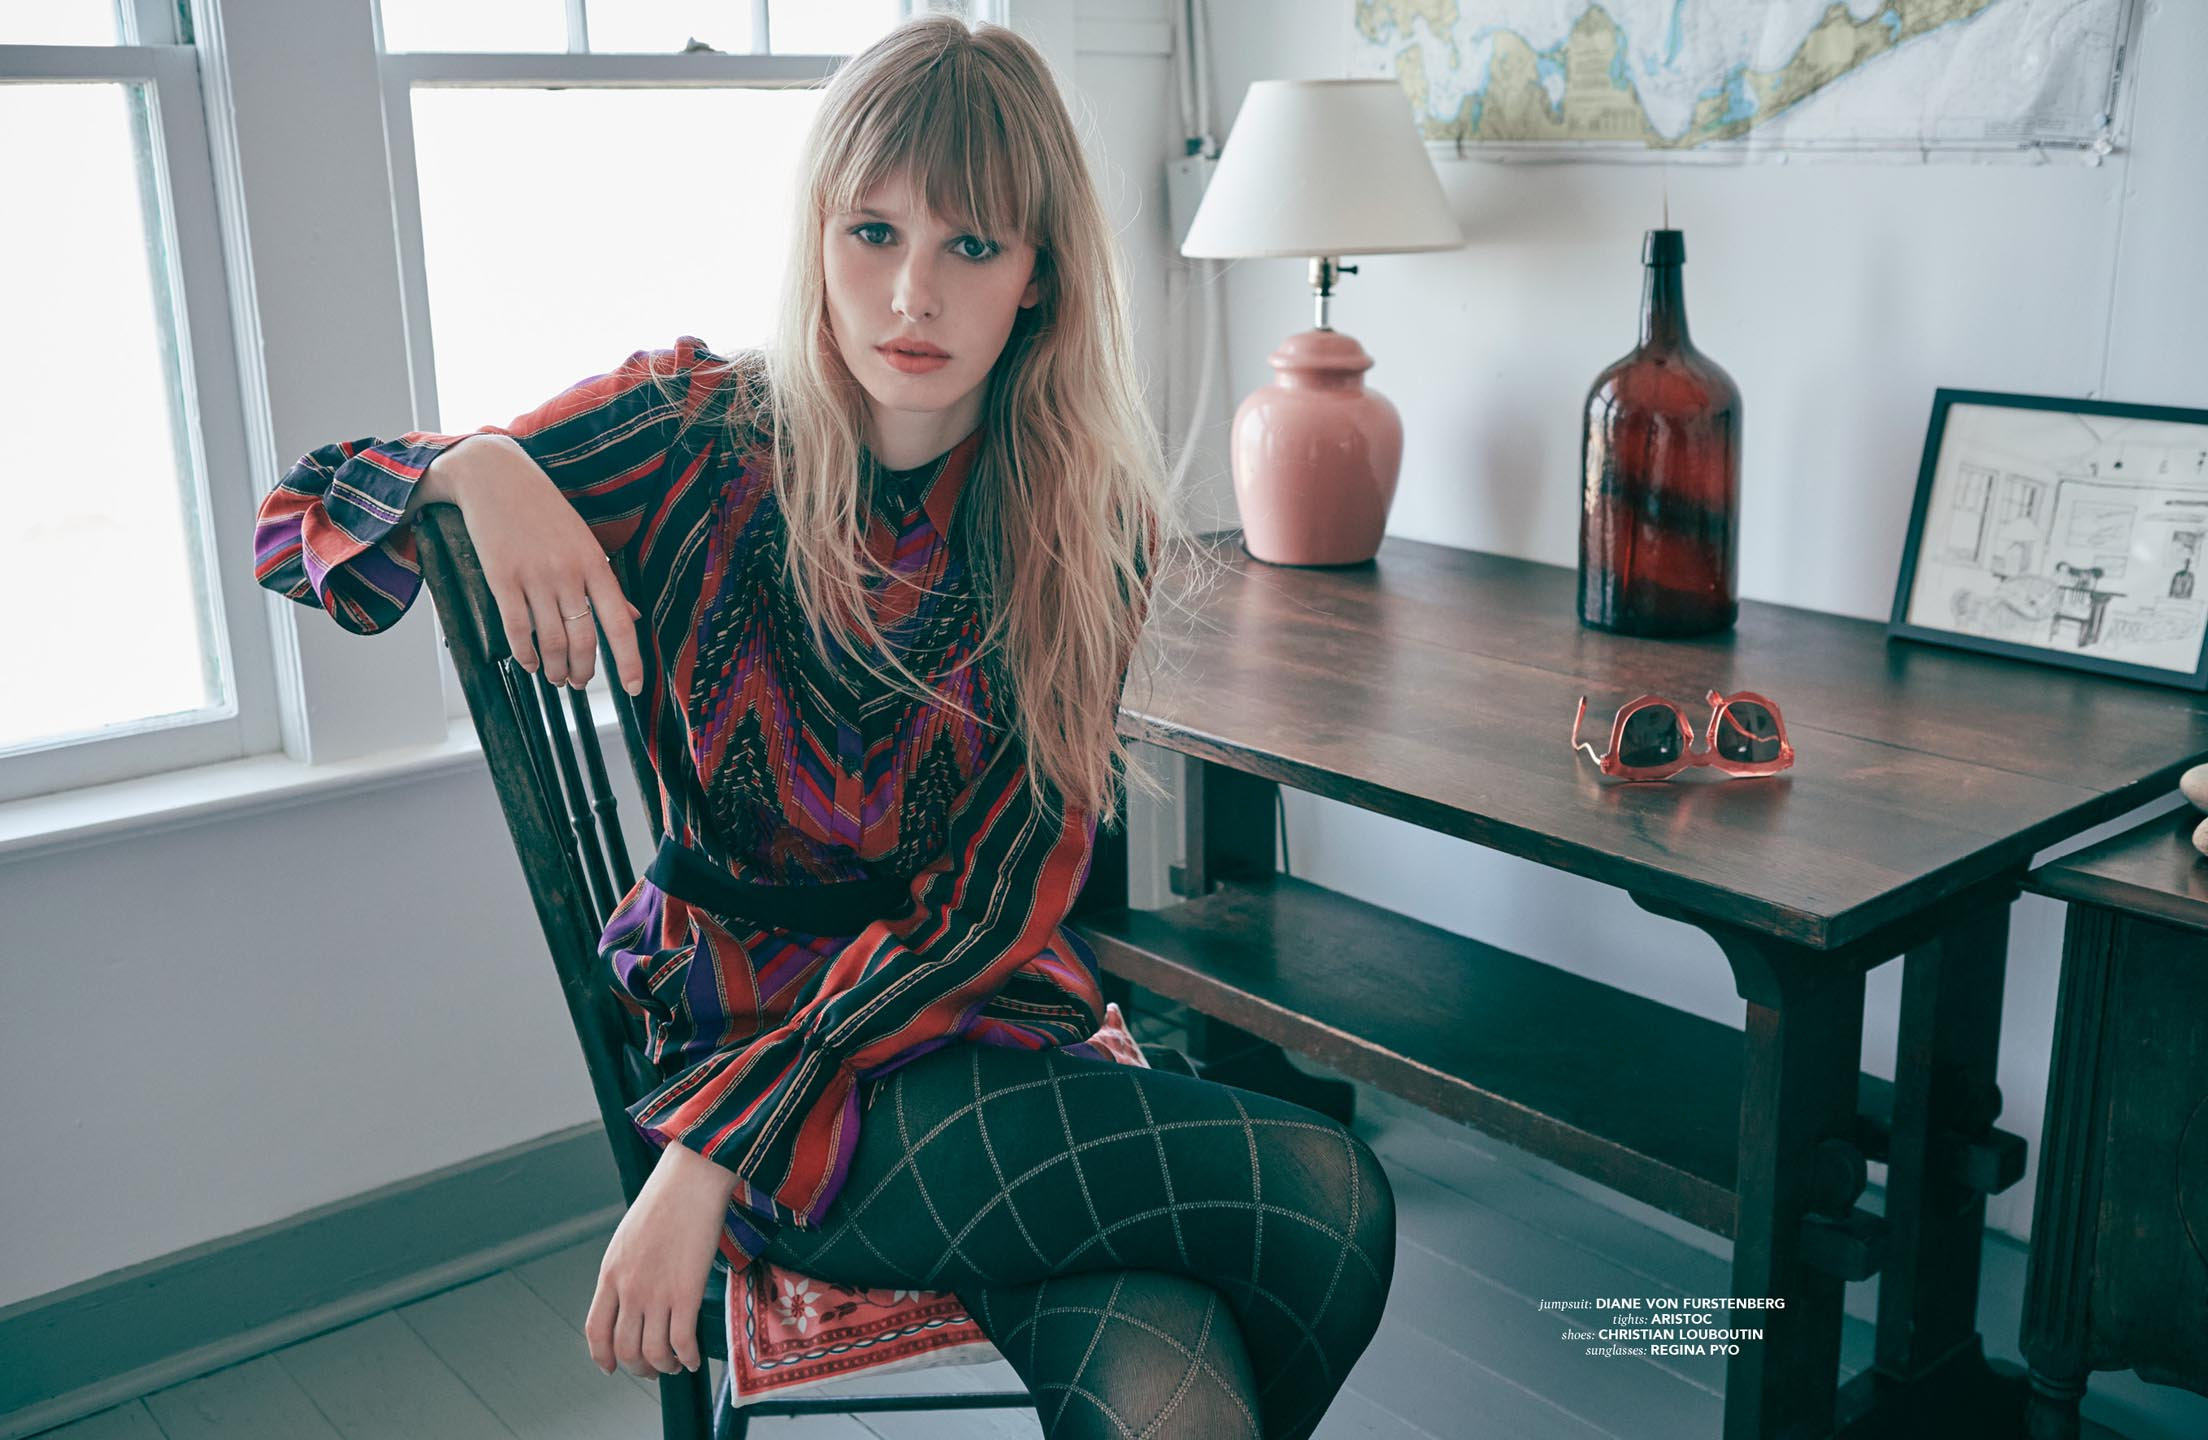 Fashion Story The Hamptons - Streets Magazine - Model  Agnieszka Lauterbach I Greg Sorensen I Fashion & Beauty Photographer I NYC